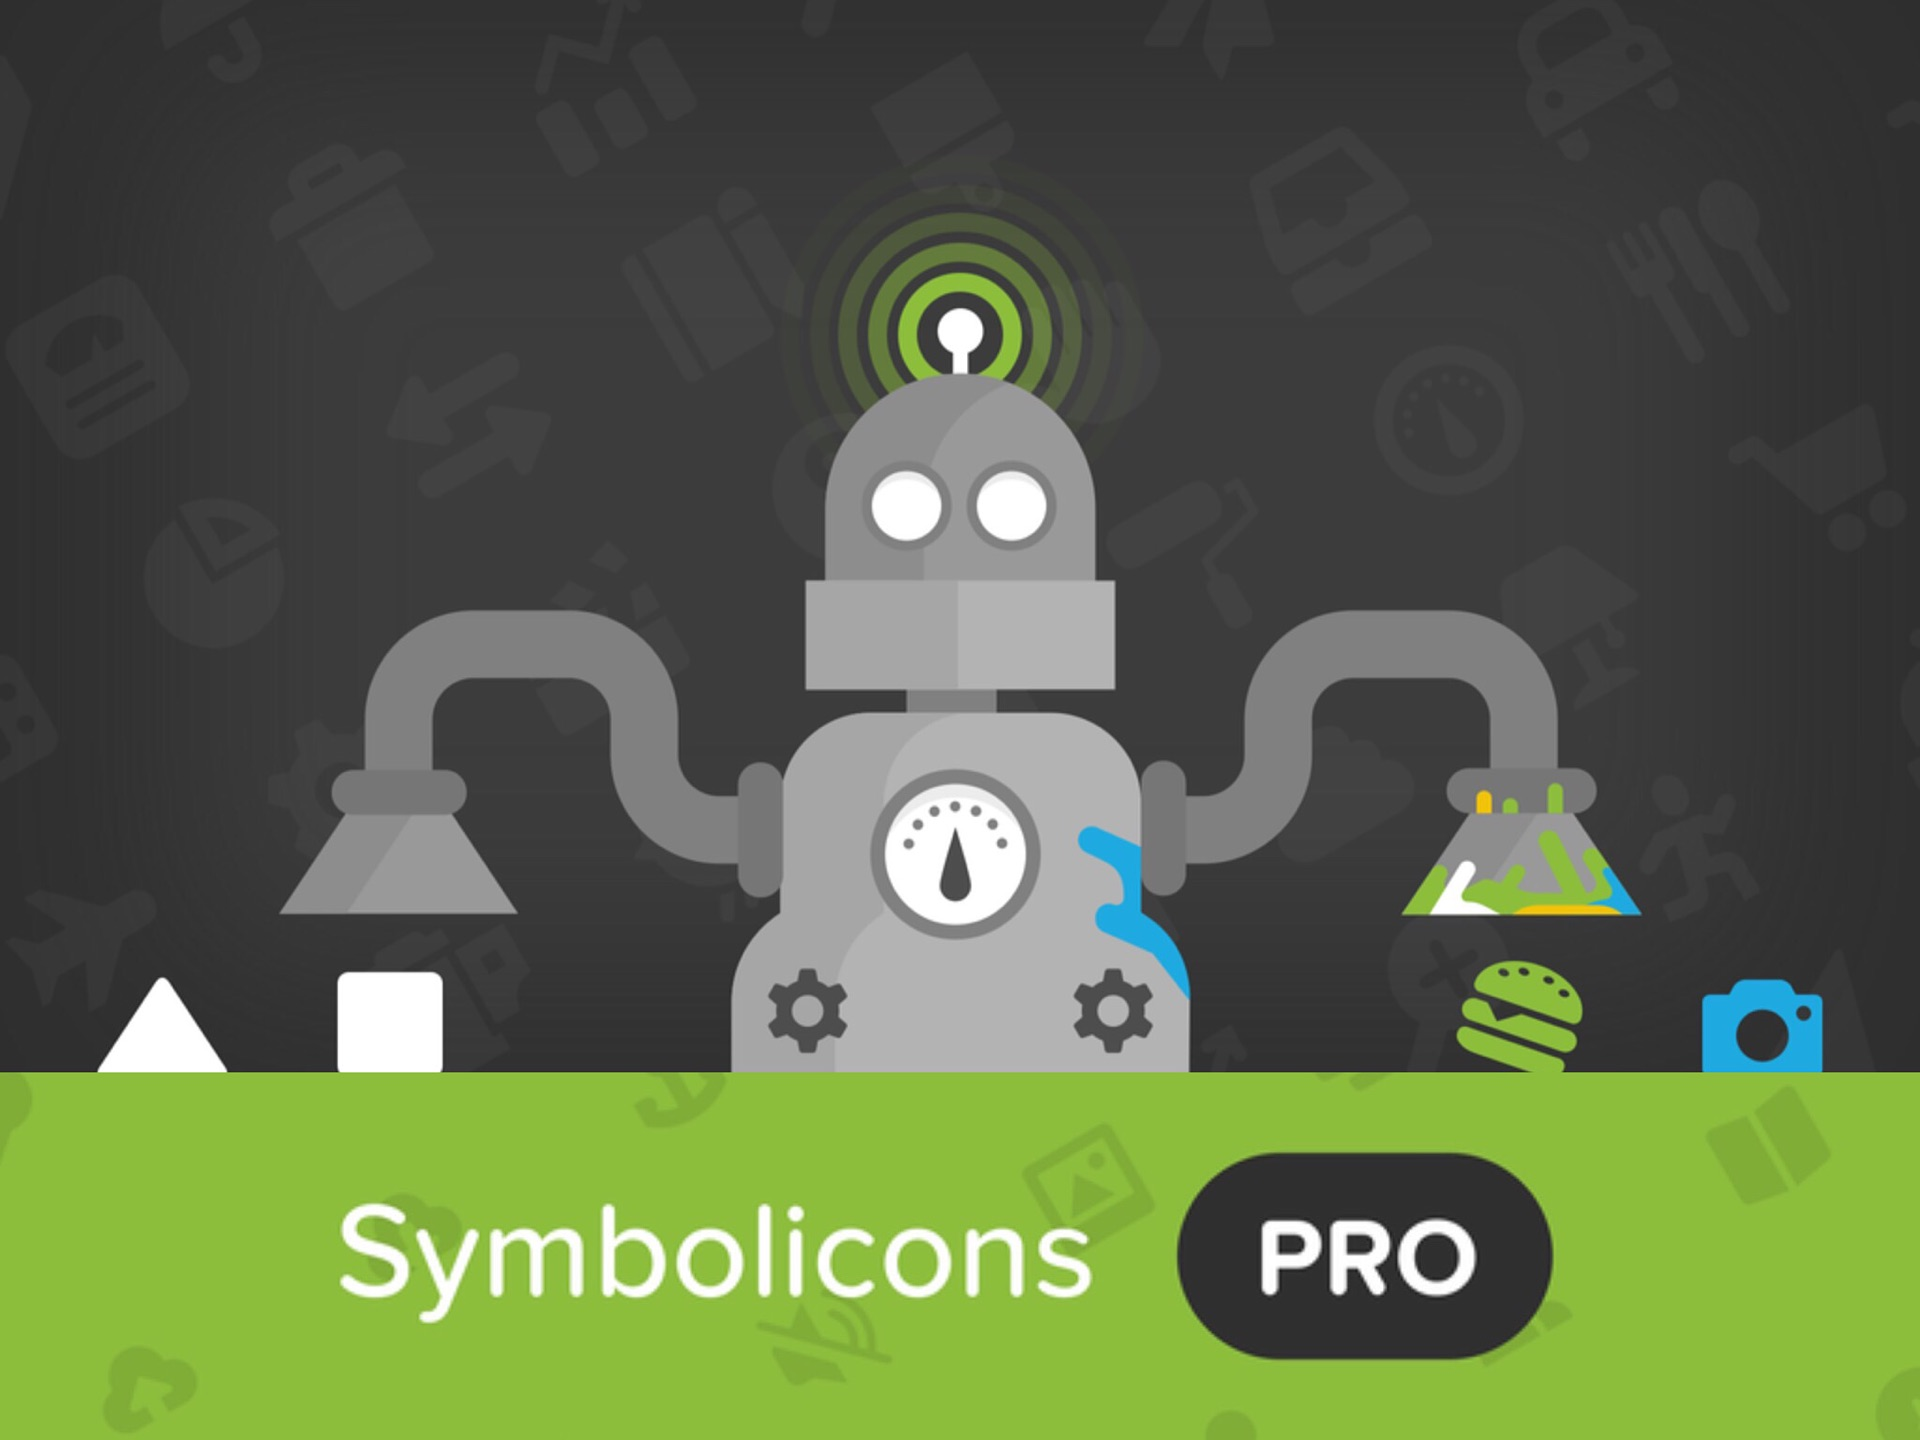 symbolicons-pro-kickstarter-jory-raphael